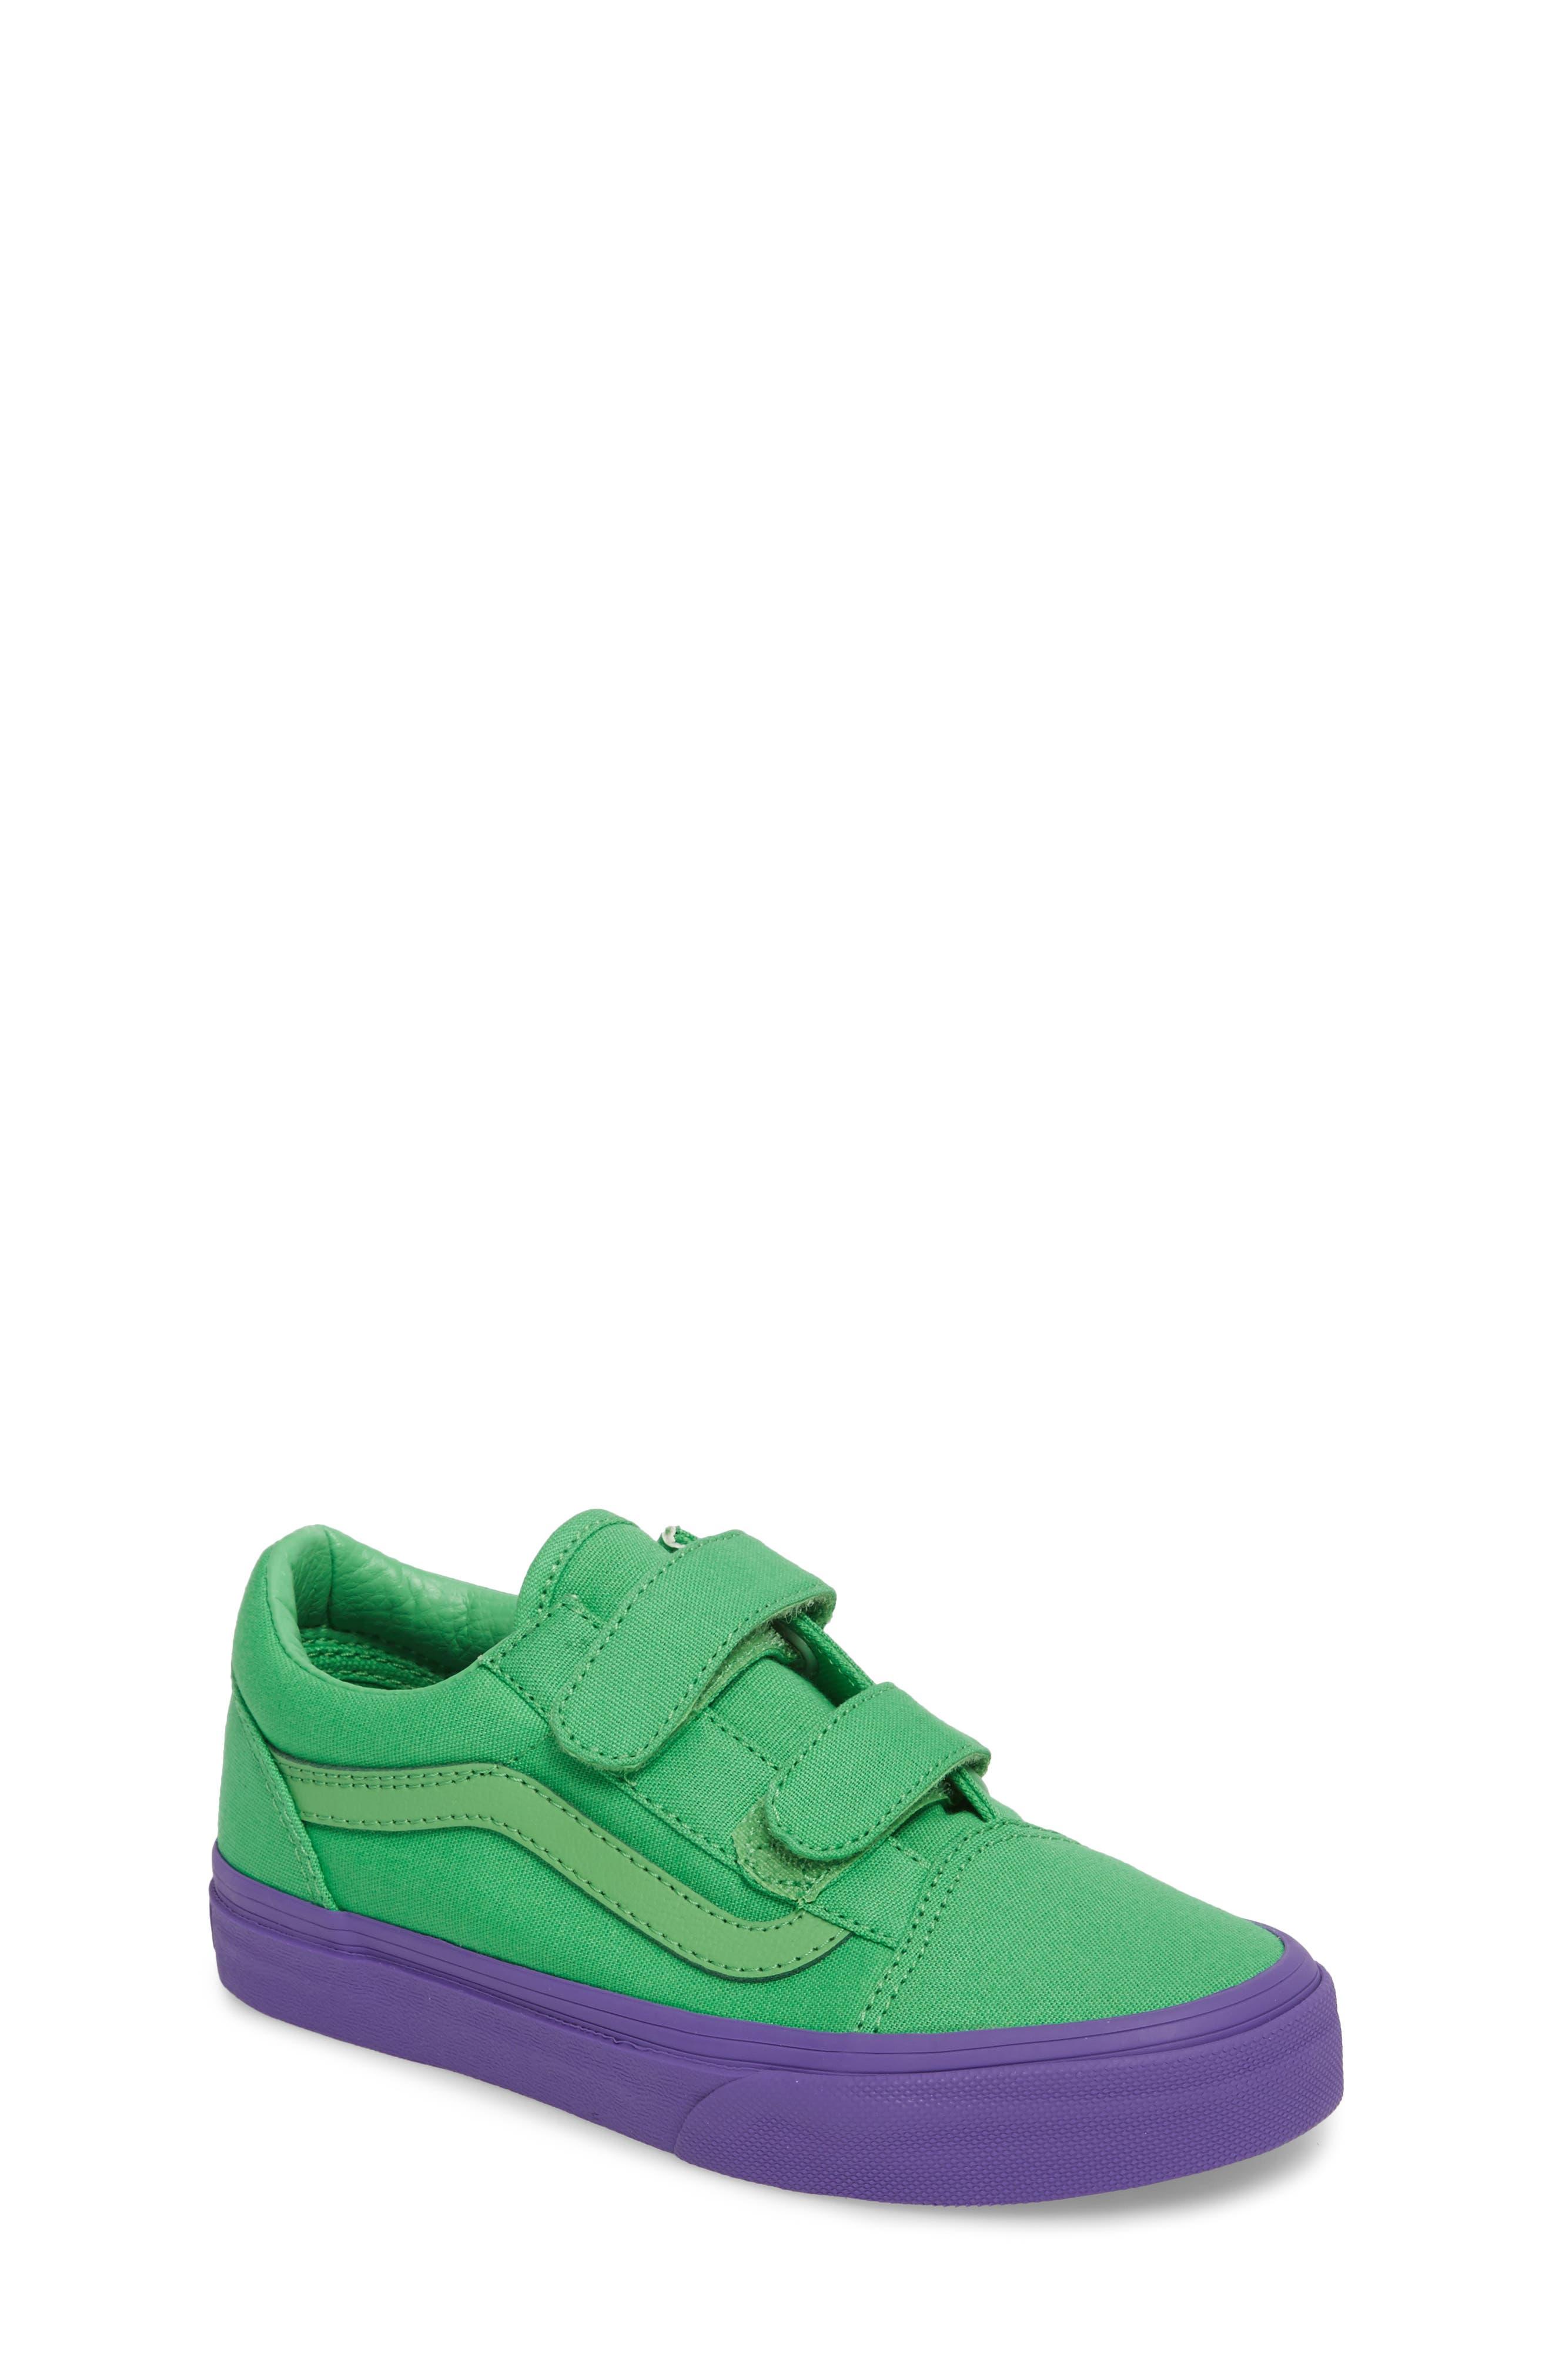 VANS Old Skool V Sneaker, Main, color, 310